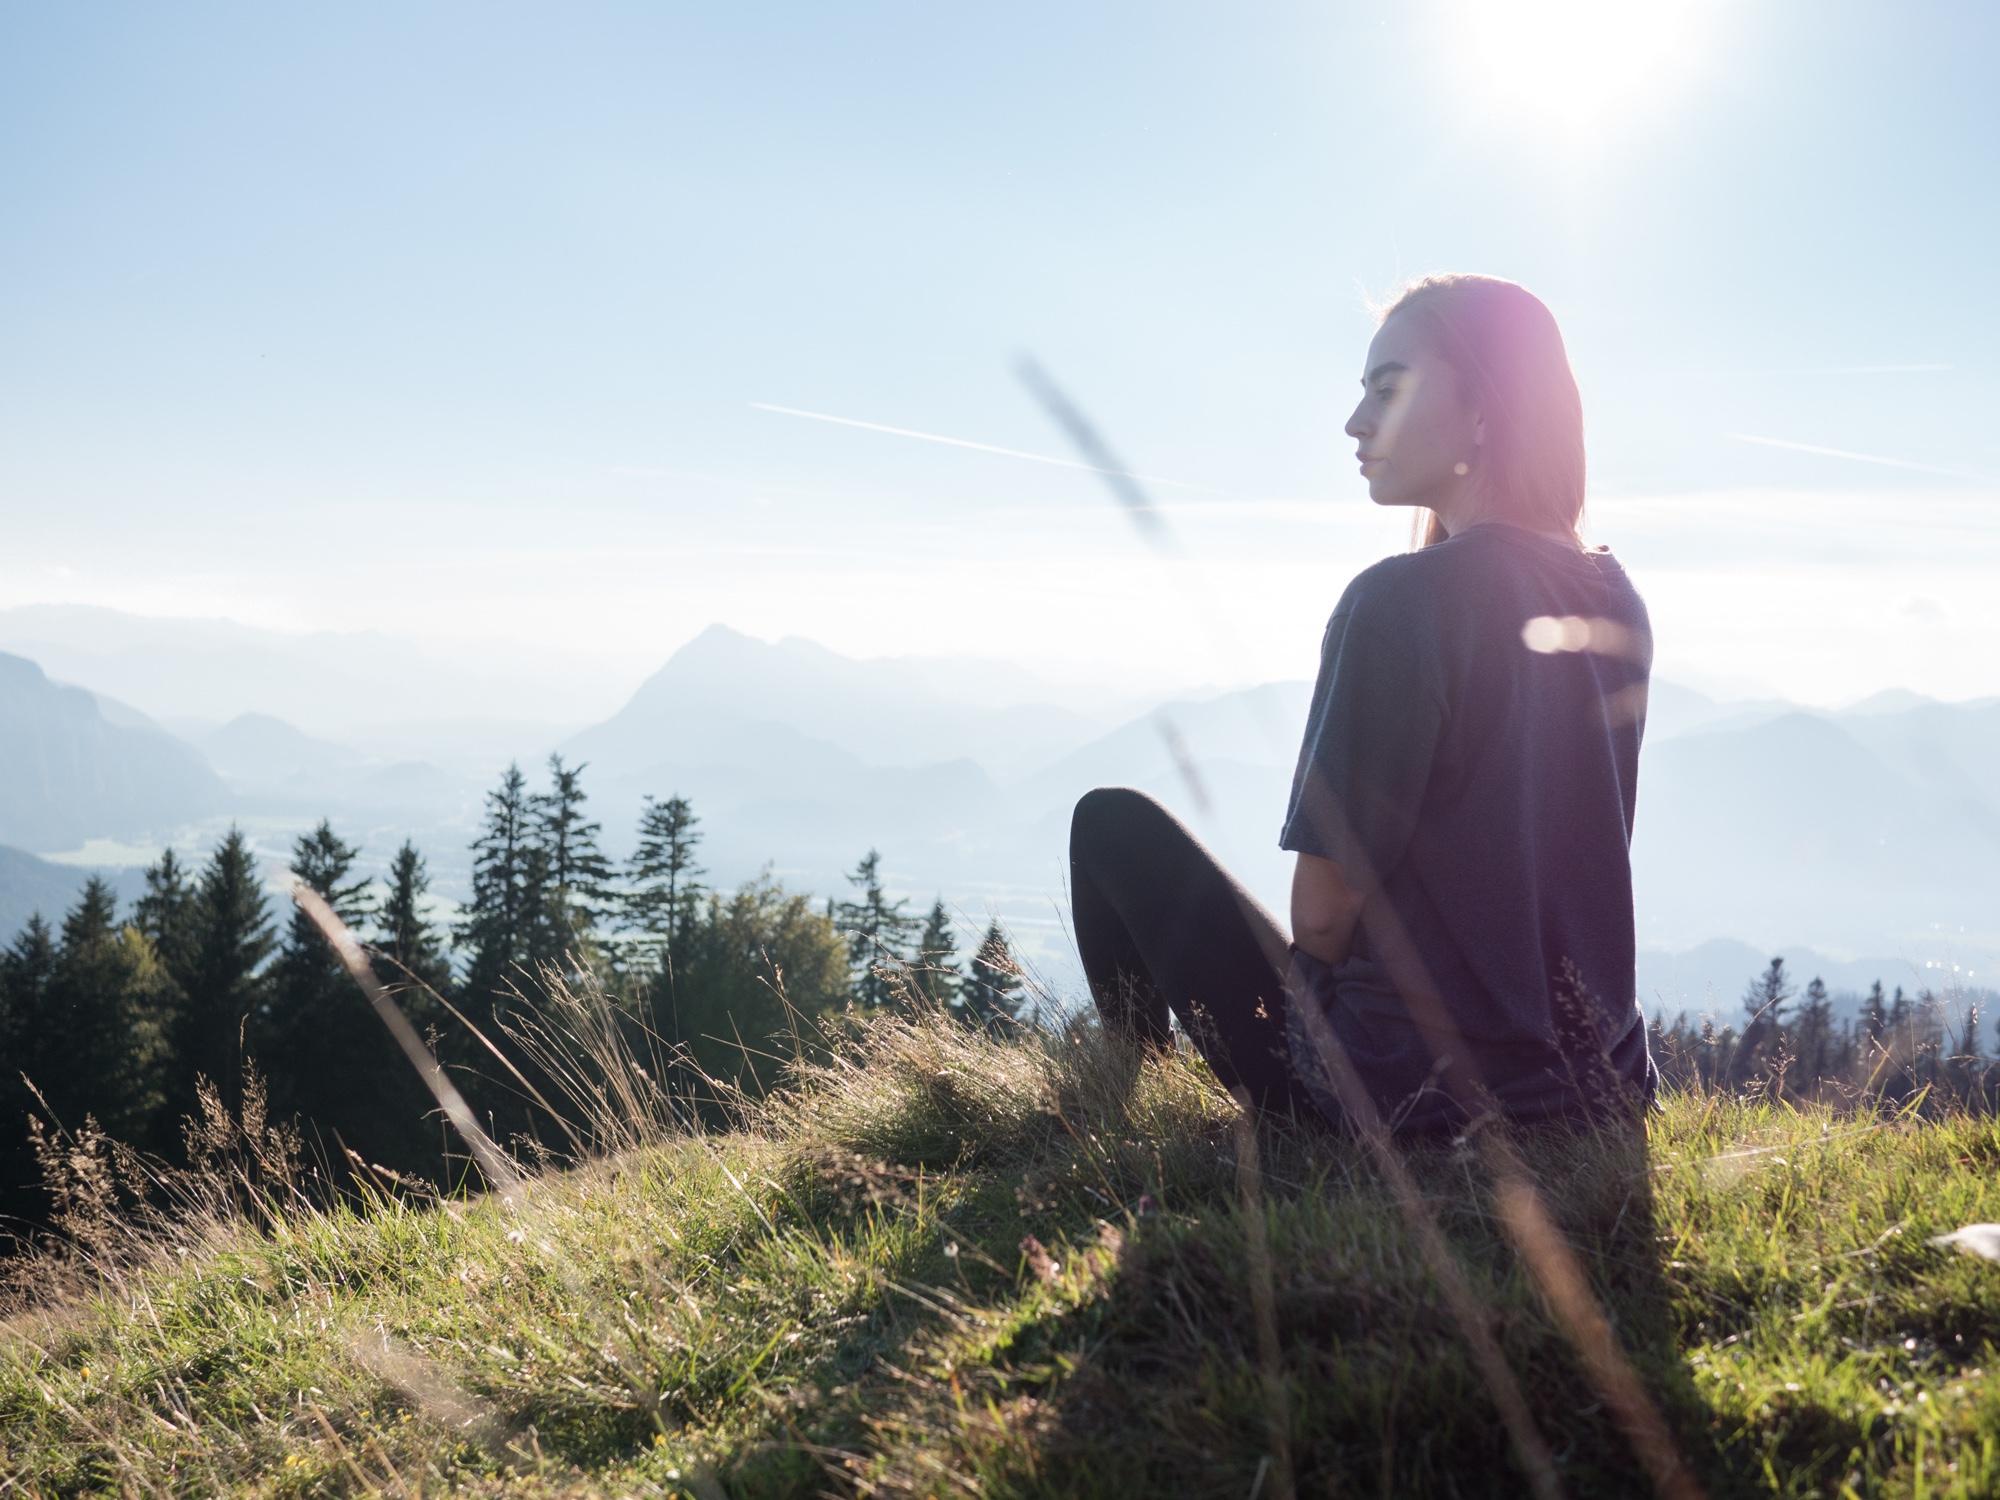 alpen-herbsturlaub-kaiserwinkl-tirol-tirol-im-herbst-wanderlust-wanderurlaubp1240636